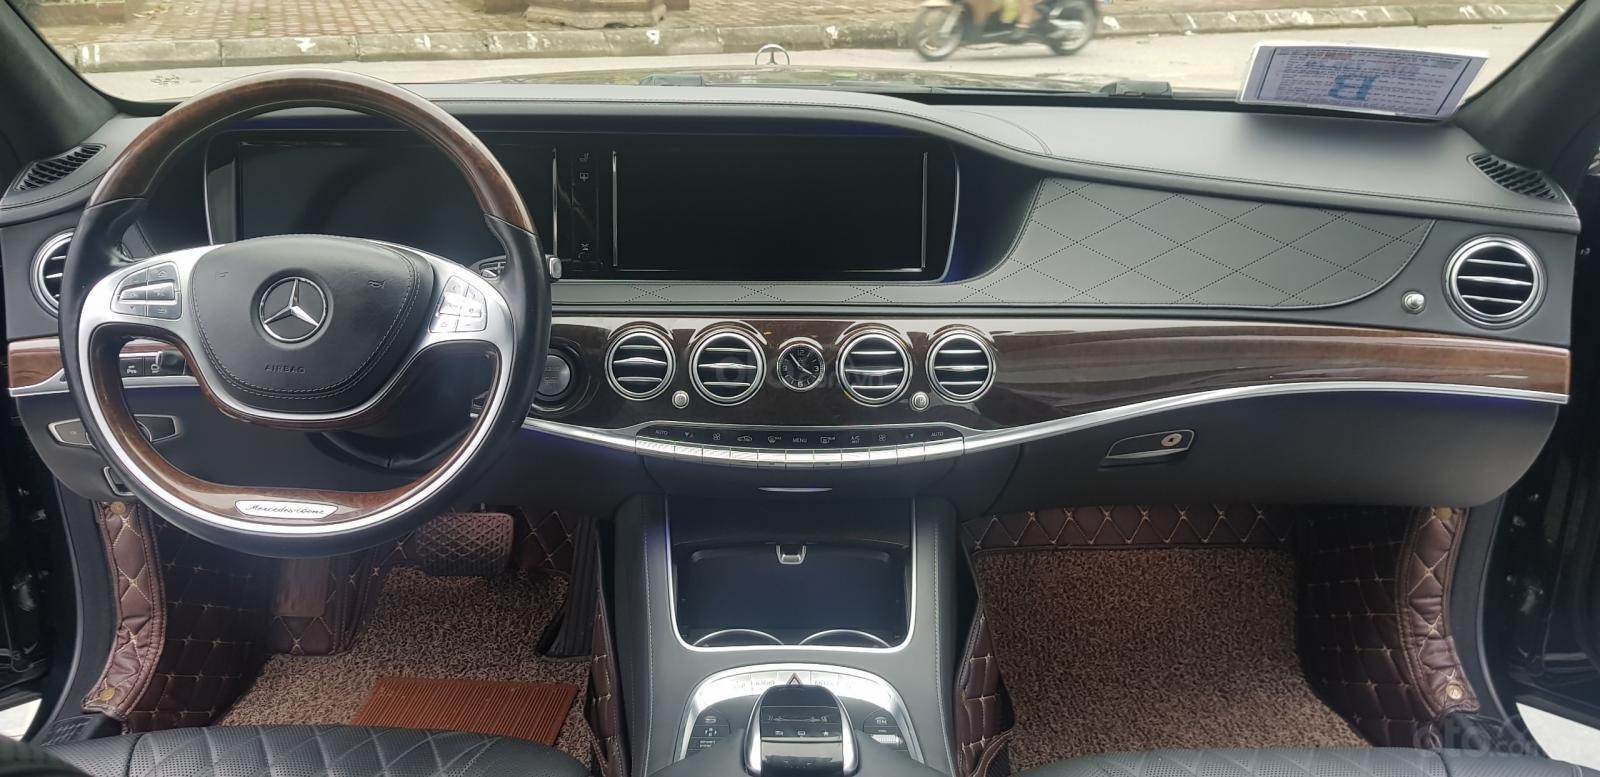 Bán Mercedes-Benz S500 SX 2016 màu đen, LH Ms  Hương 094.539.2468 (18)